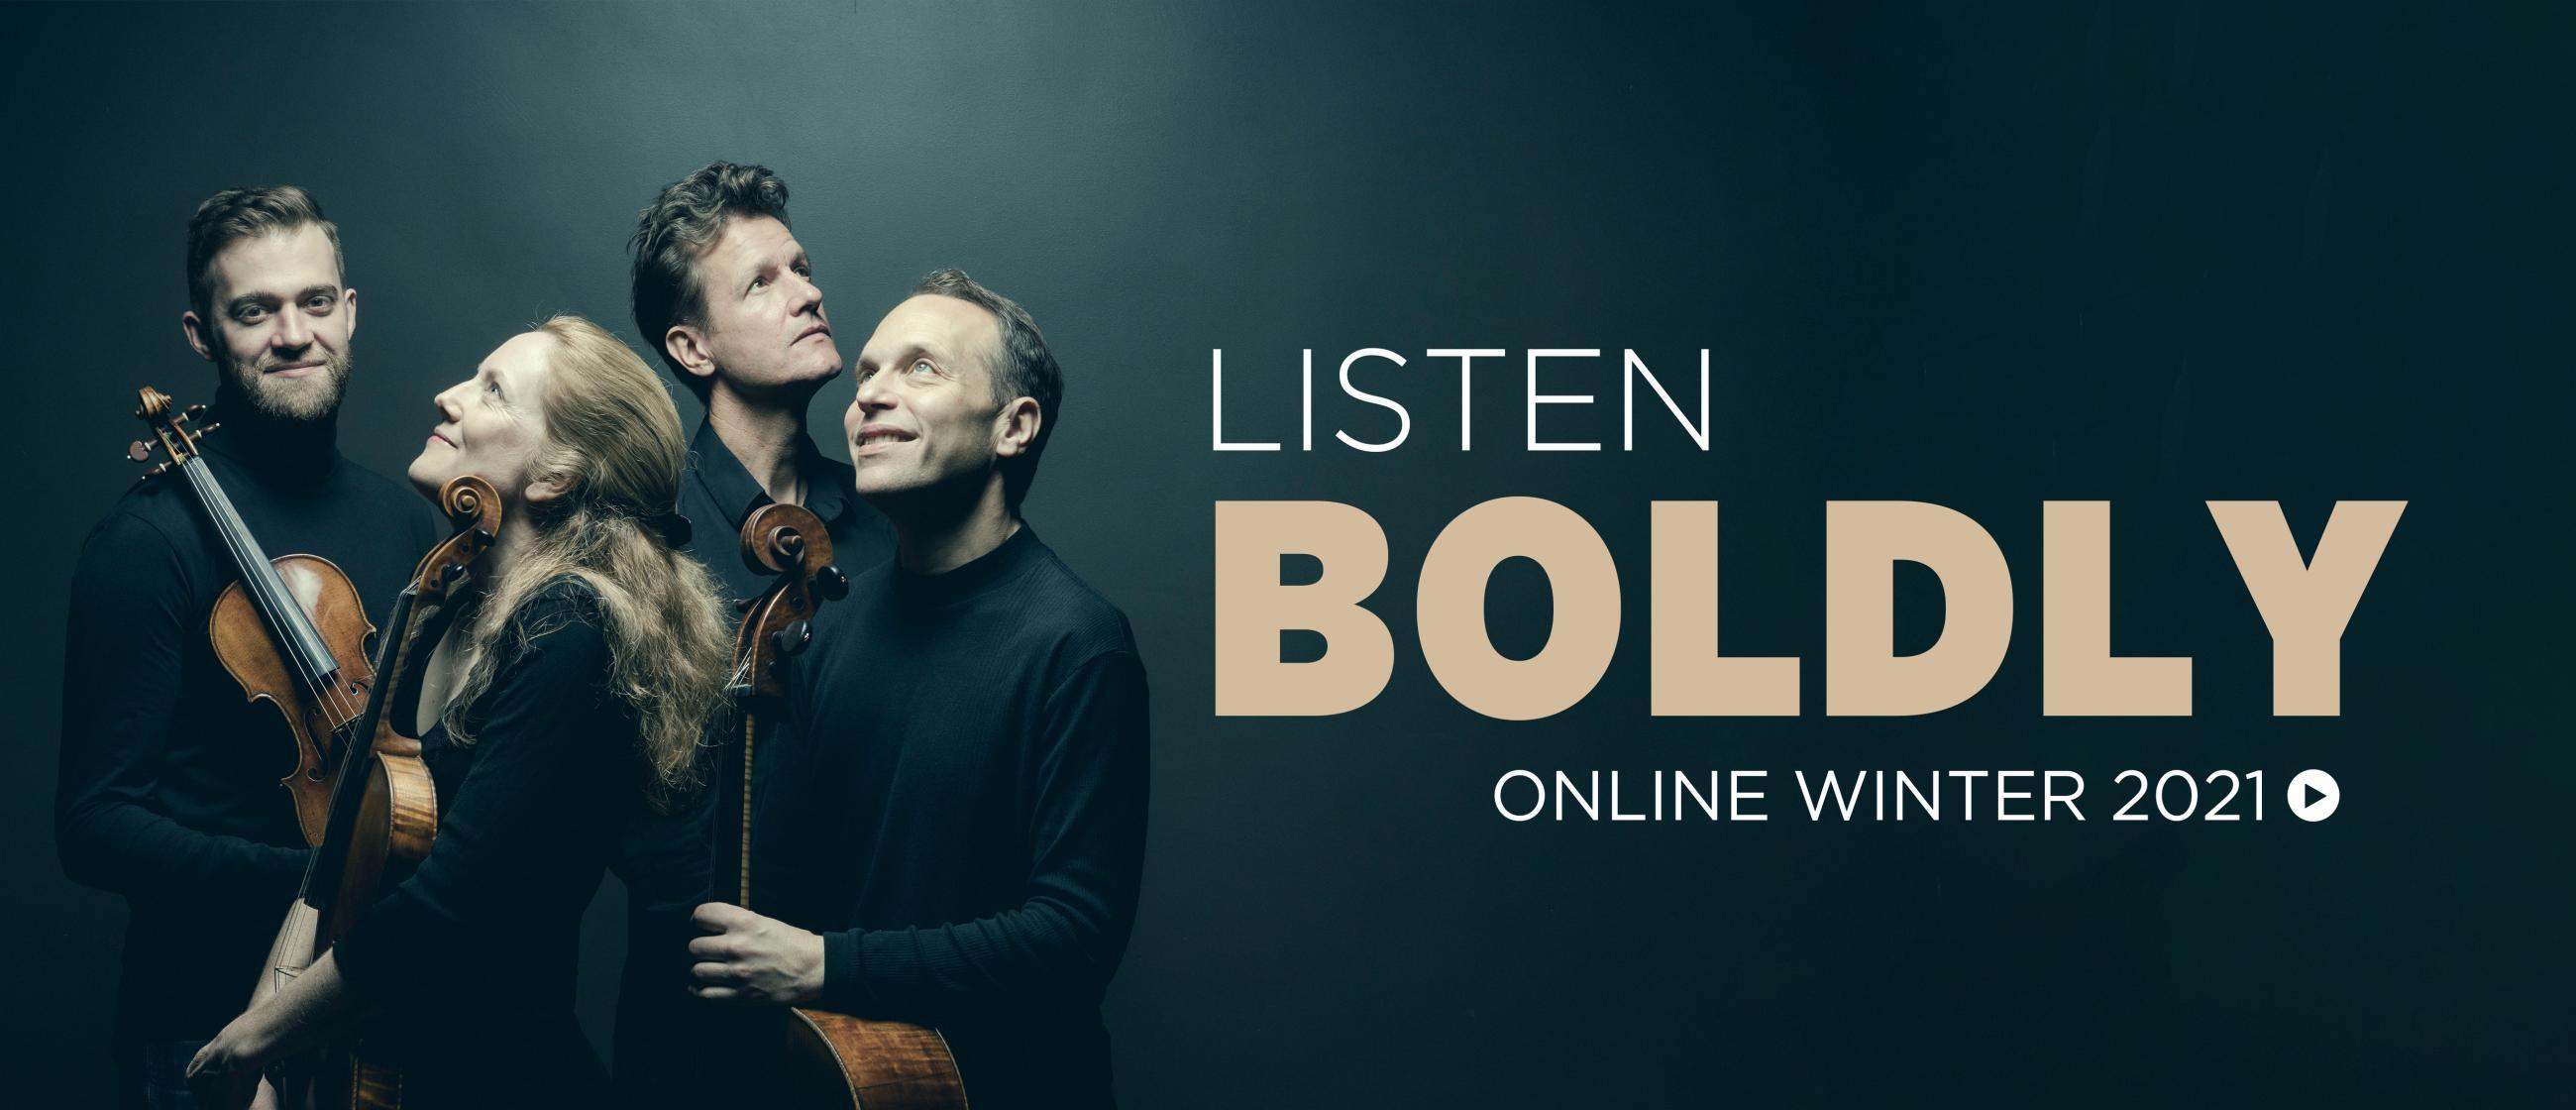 St. Lawrence String Quartet: text reads Listen Boldly Online Winter 2021